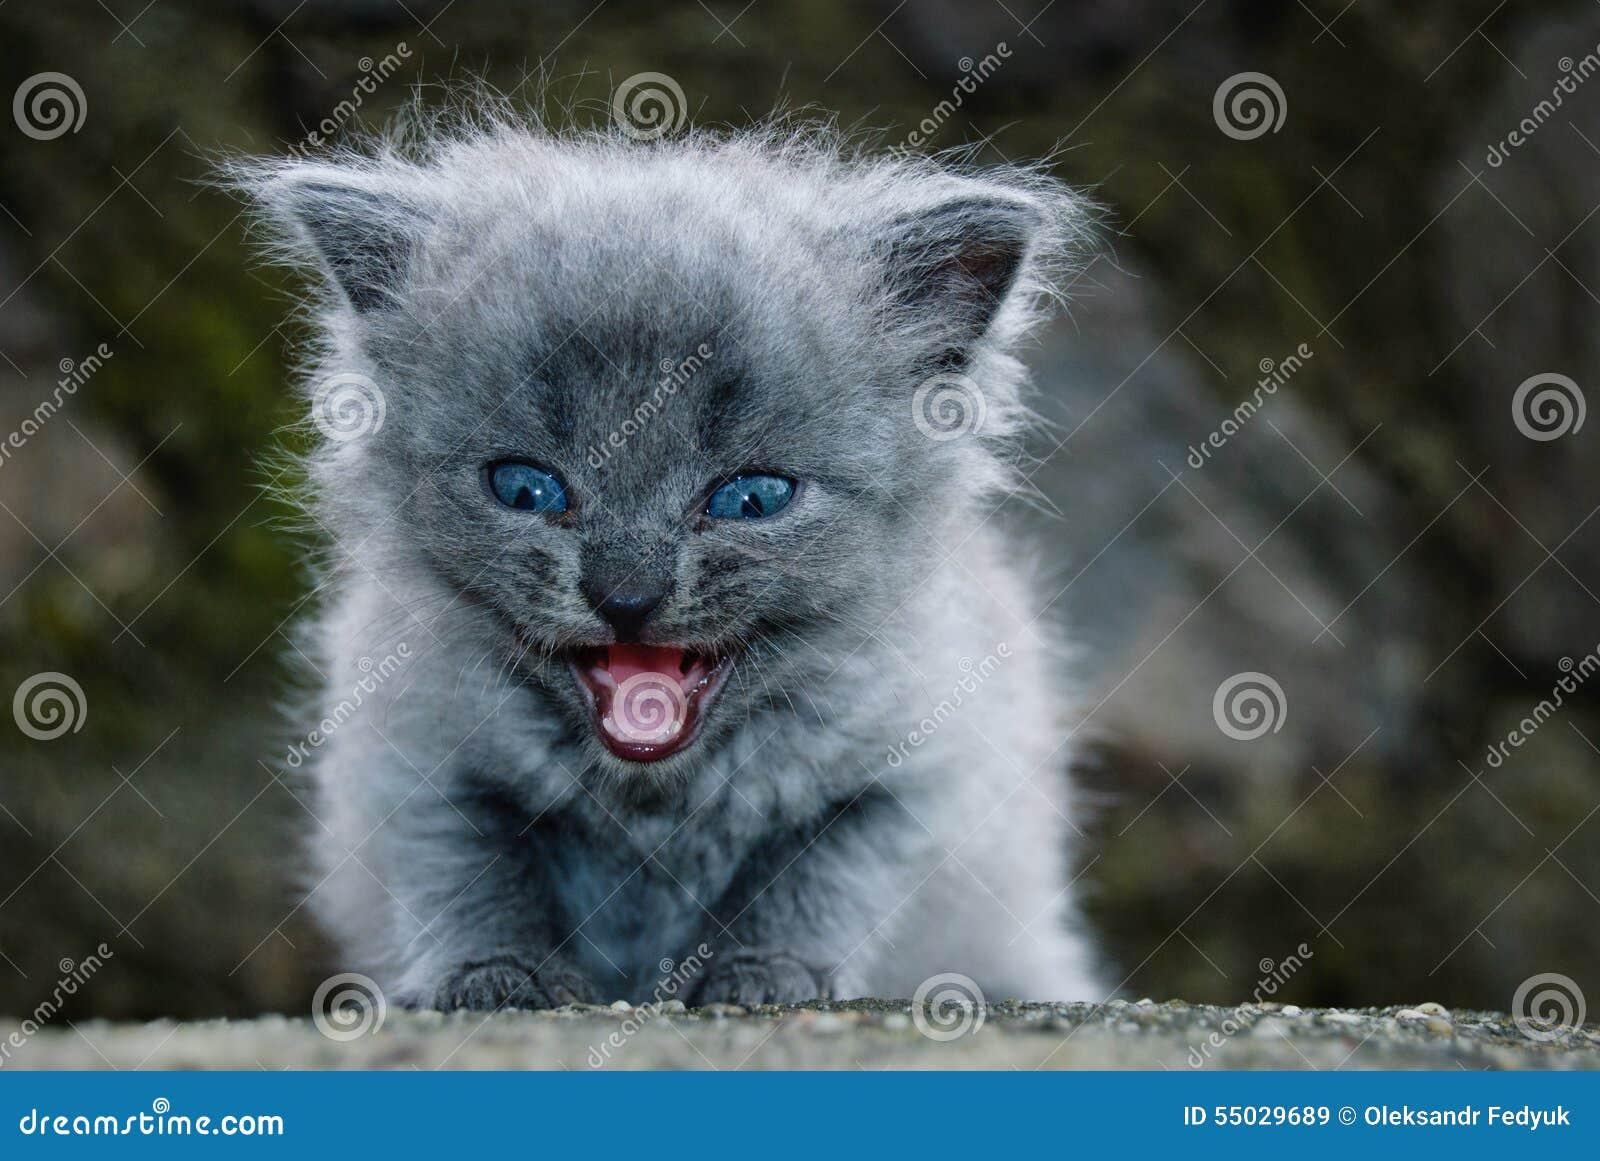 O gatinho pequeno